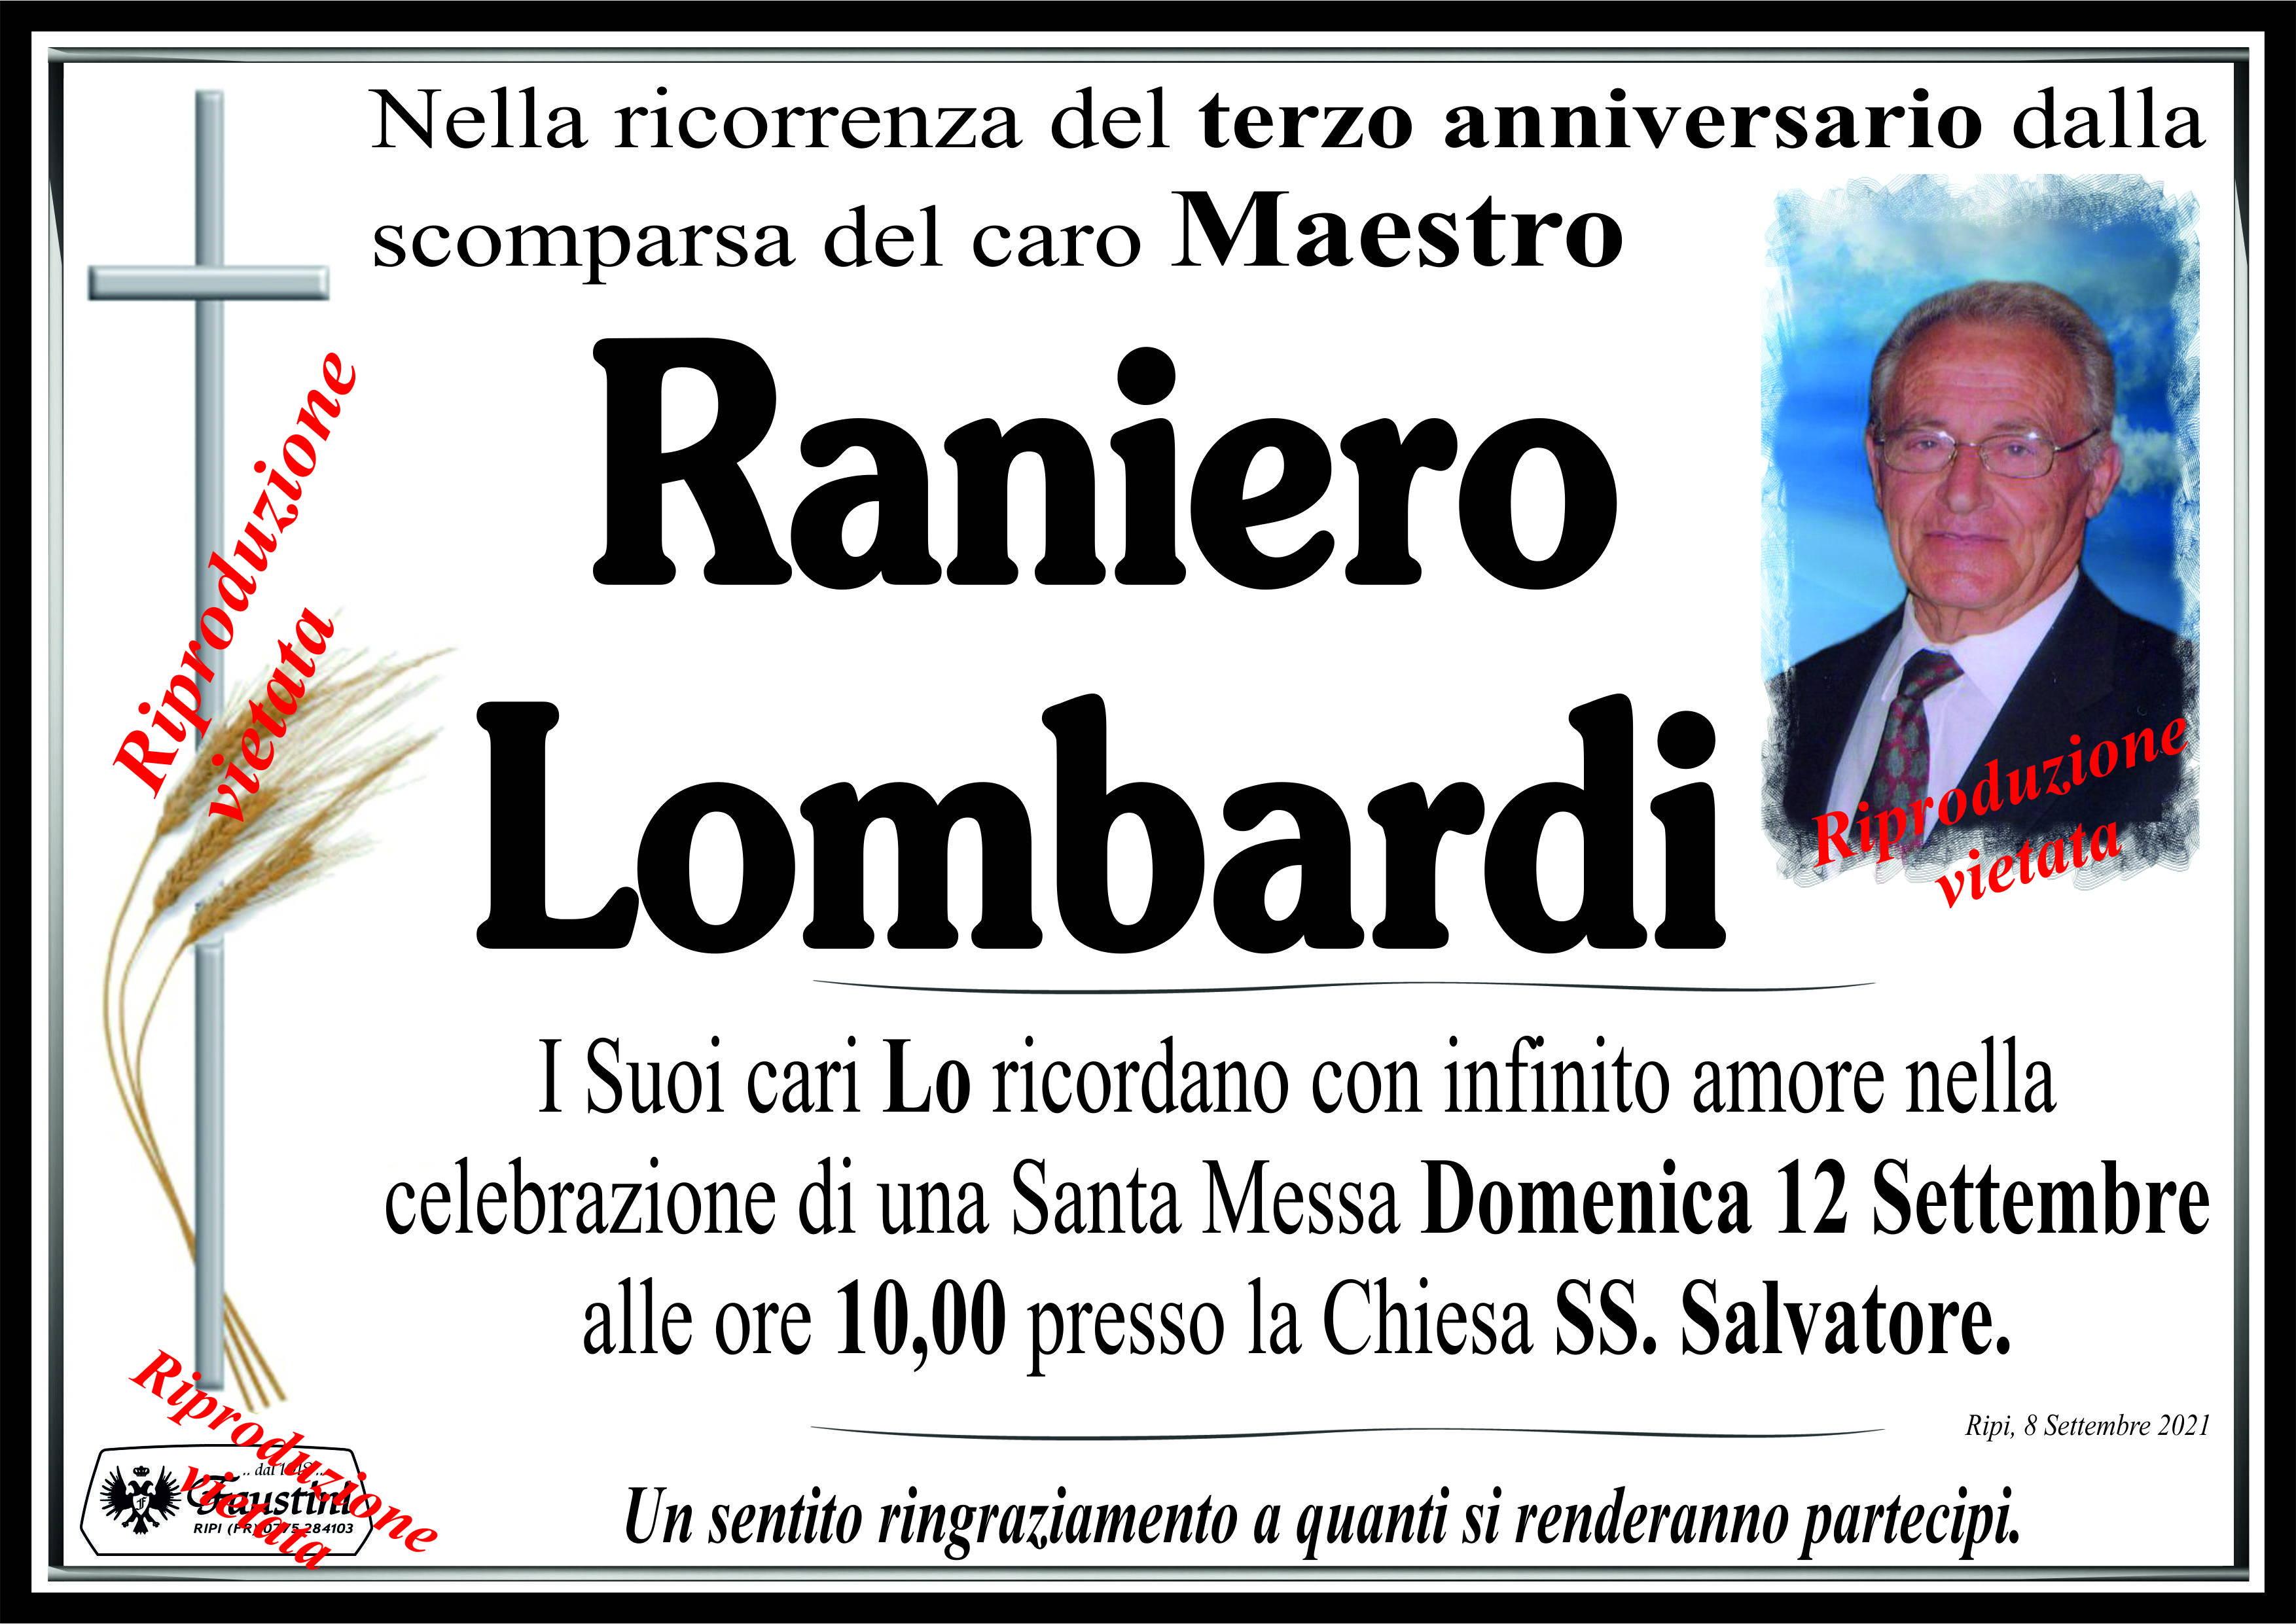 Raniero Lombardi